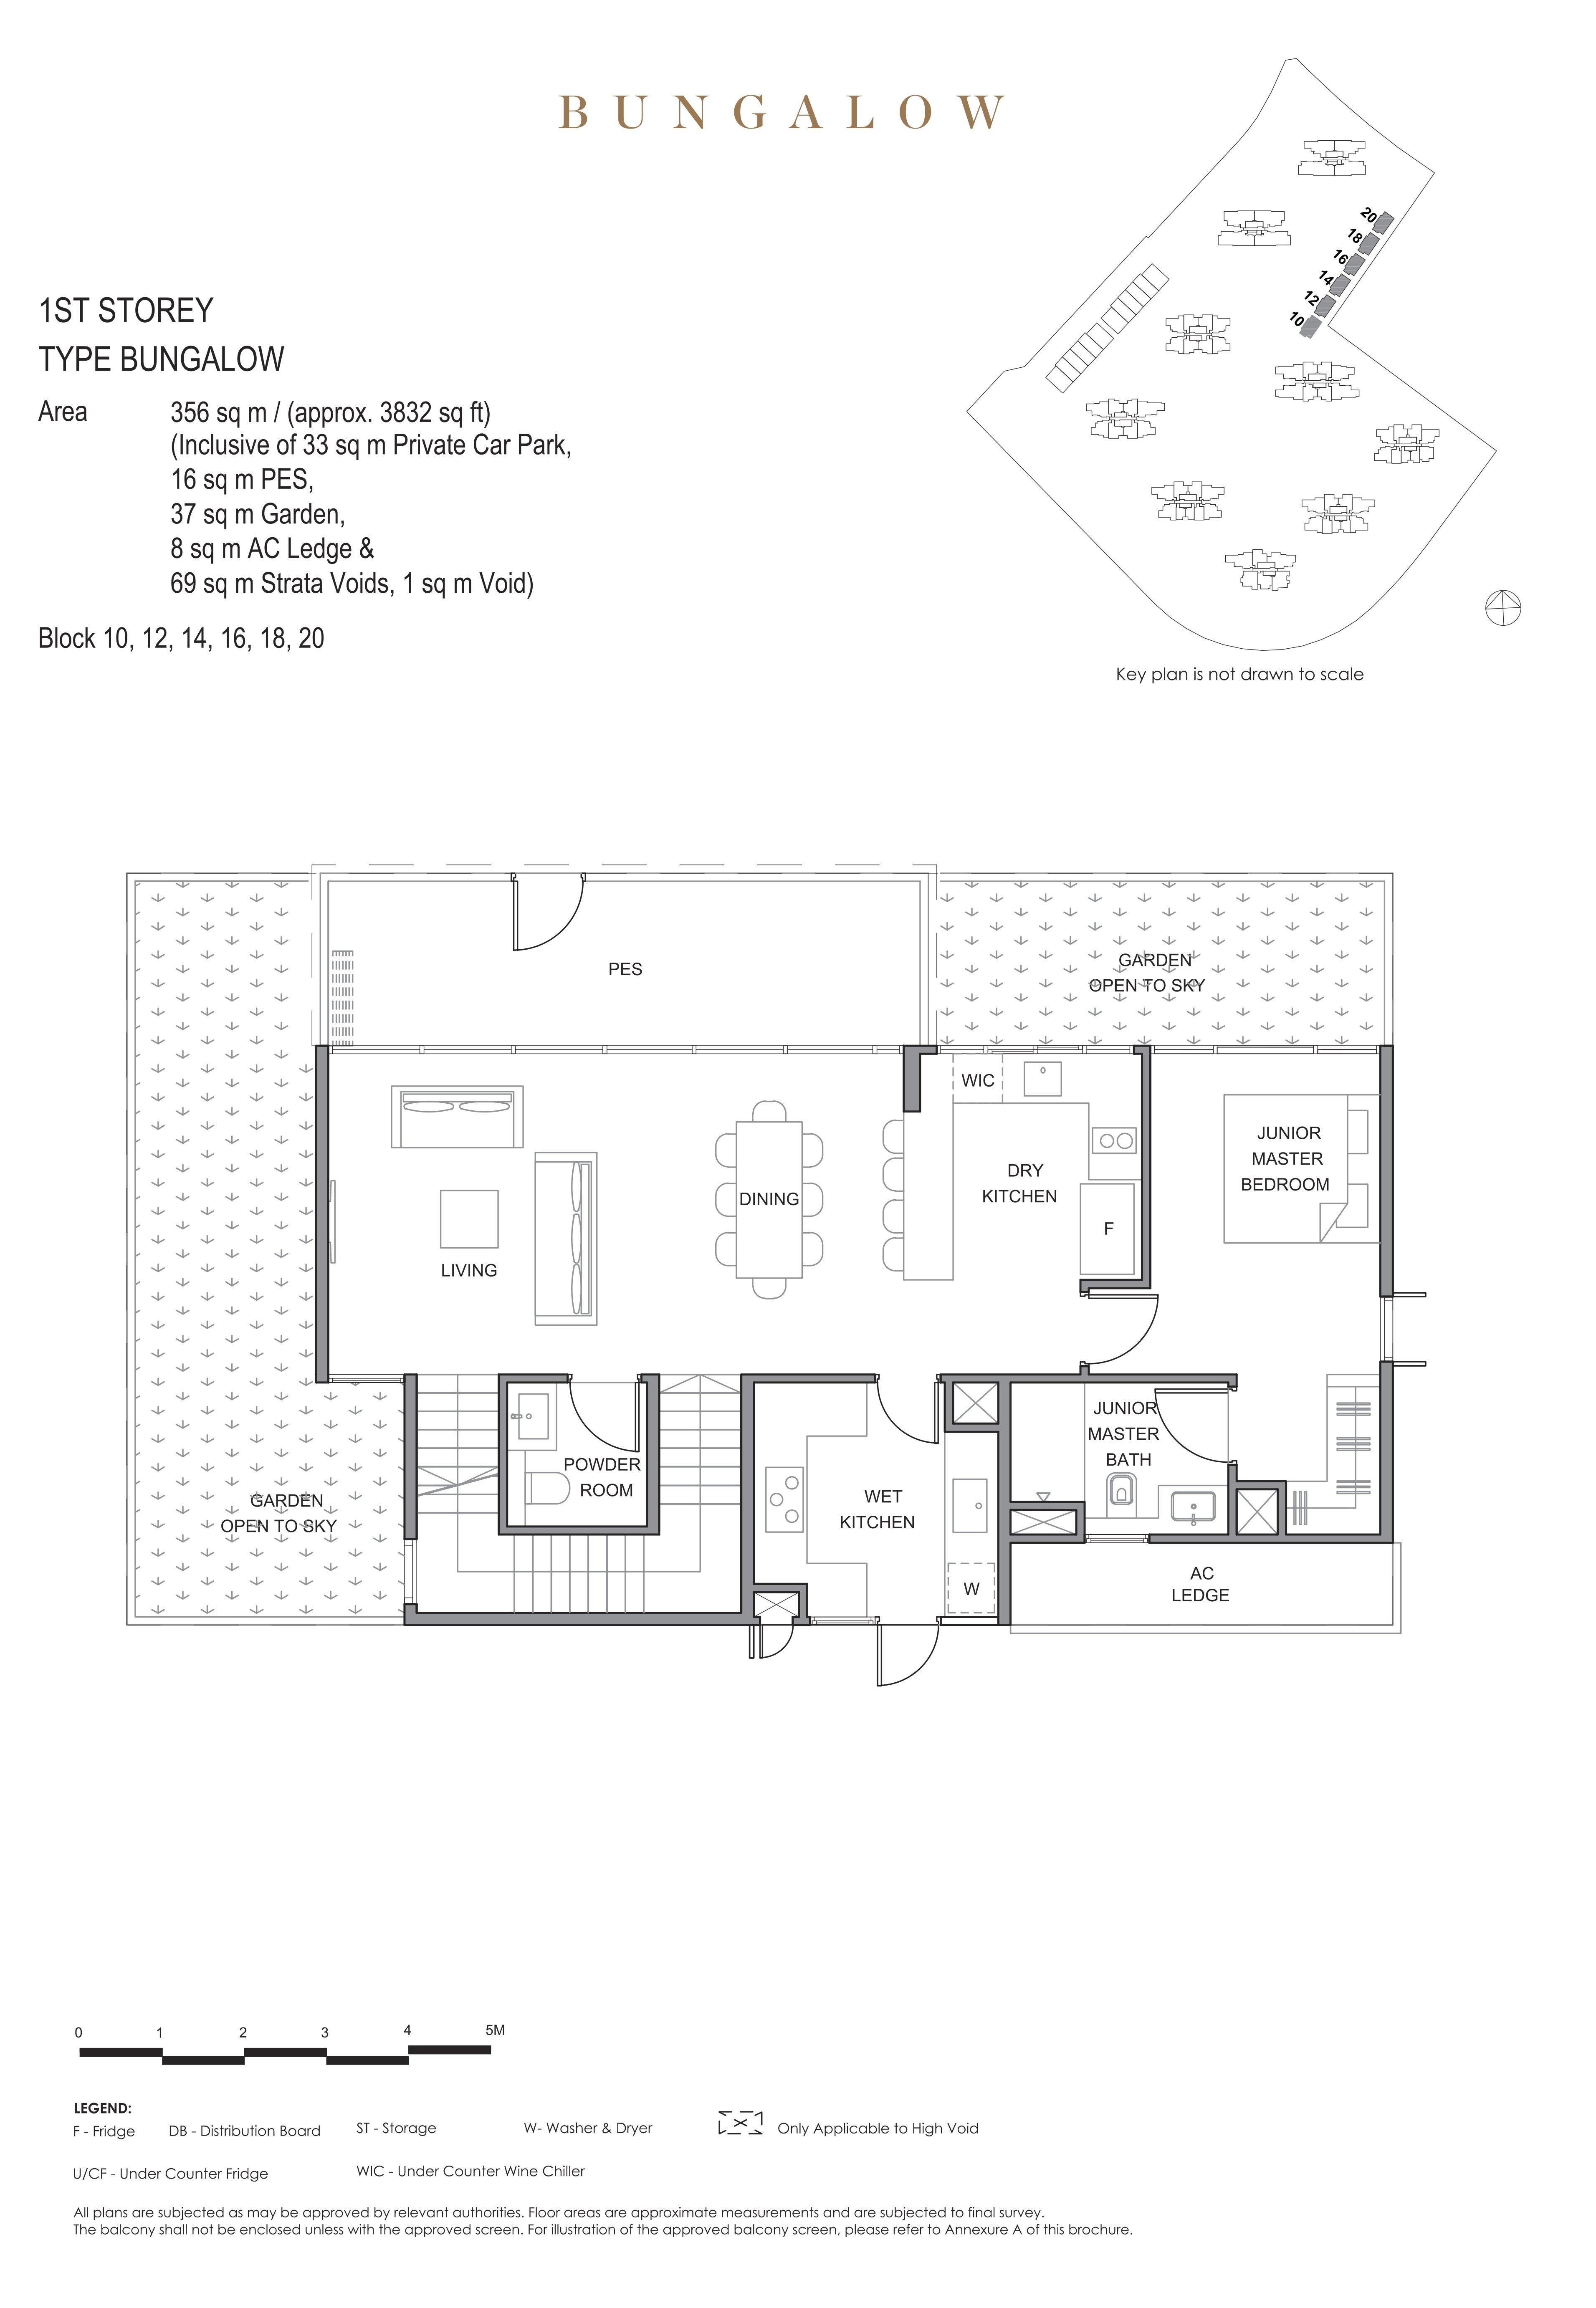 Parc Clematis 锦泰门第 masterpiece bungalow 1st storey